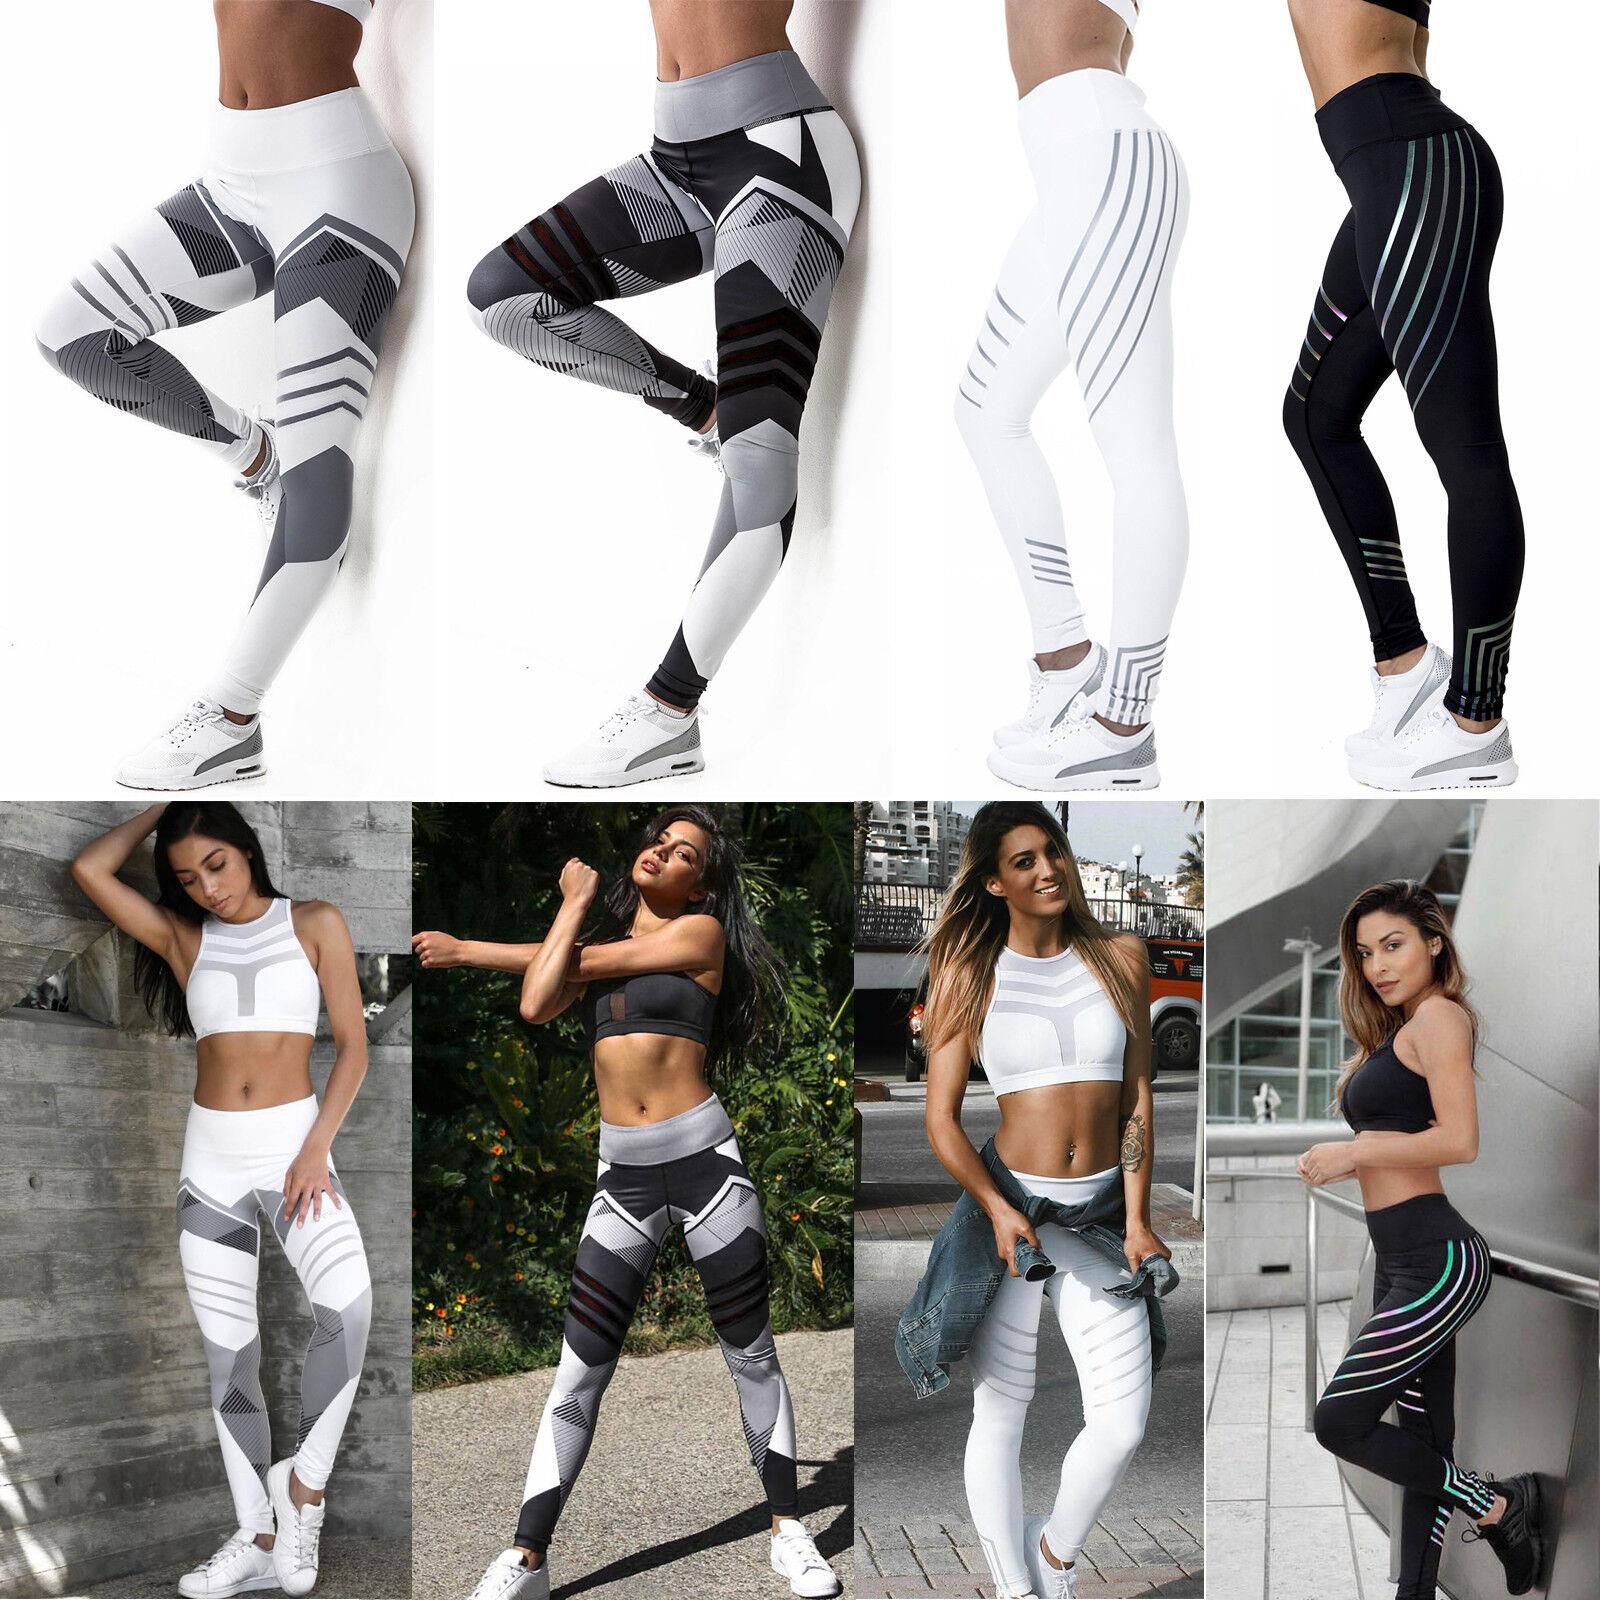 Sports Womens Yoga Leggings Fitness Gym Exercise Running Jogging Pants Trouser